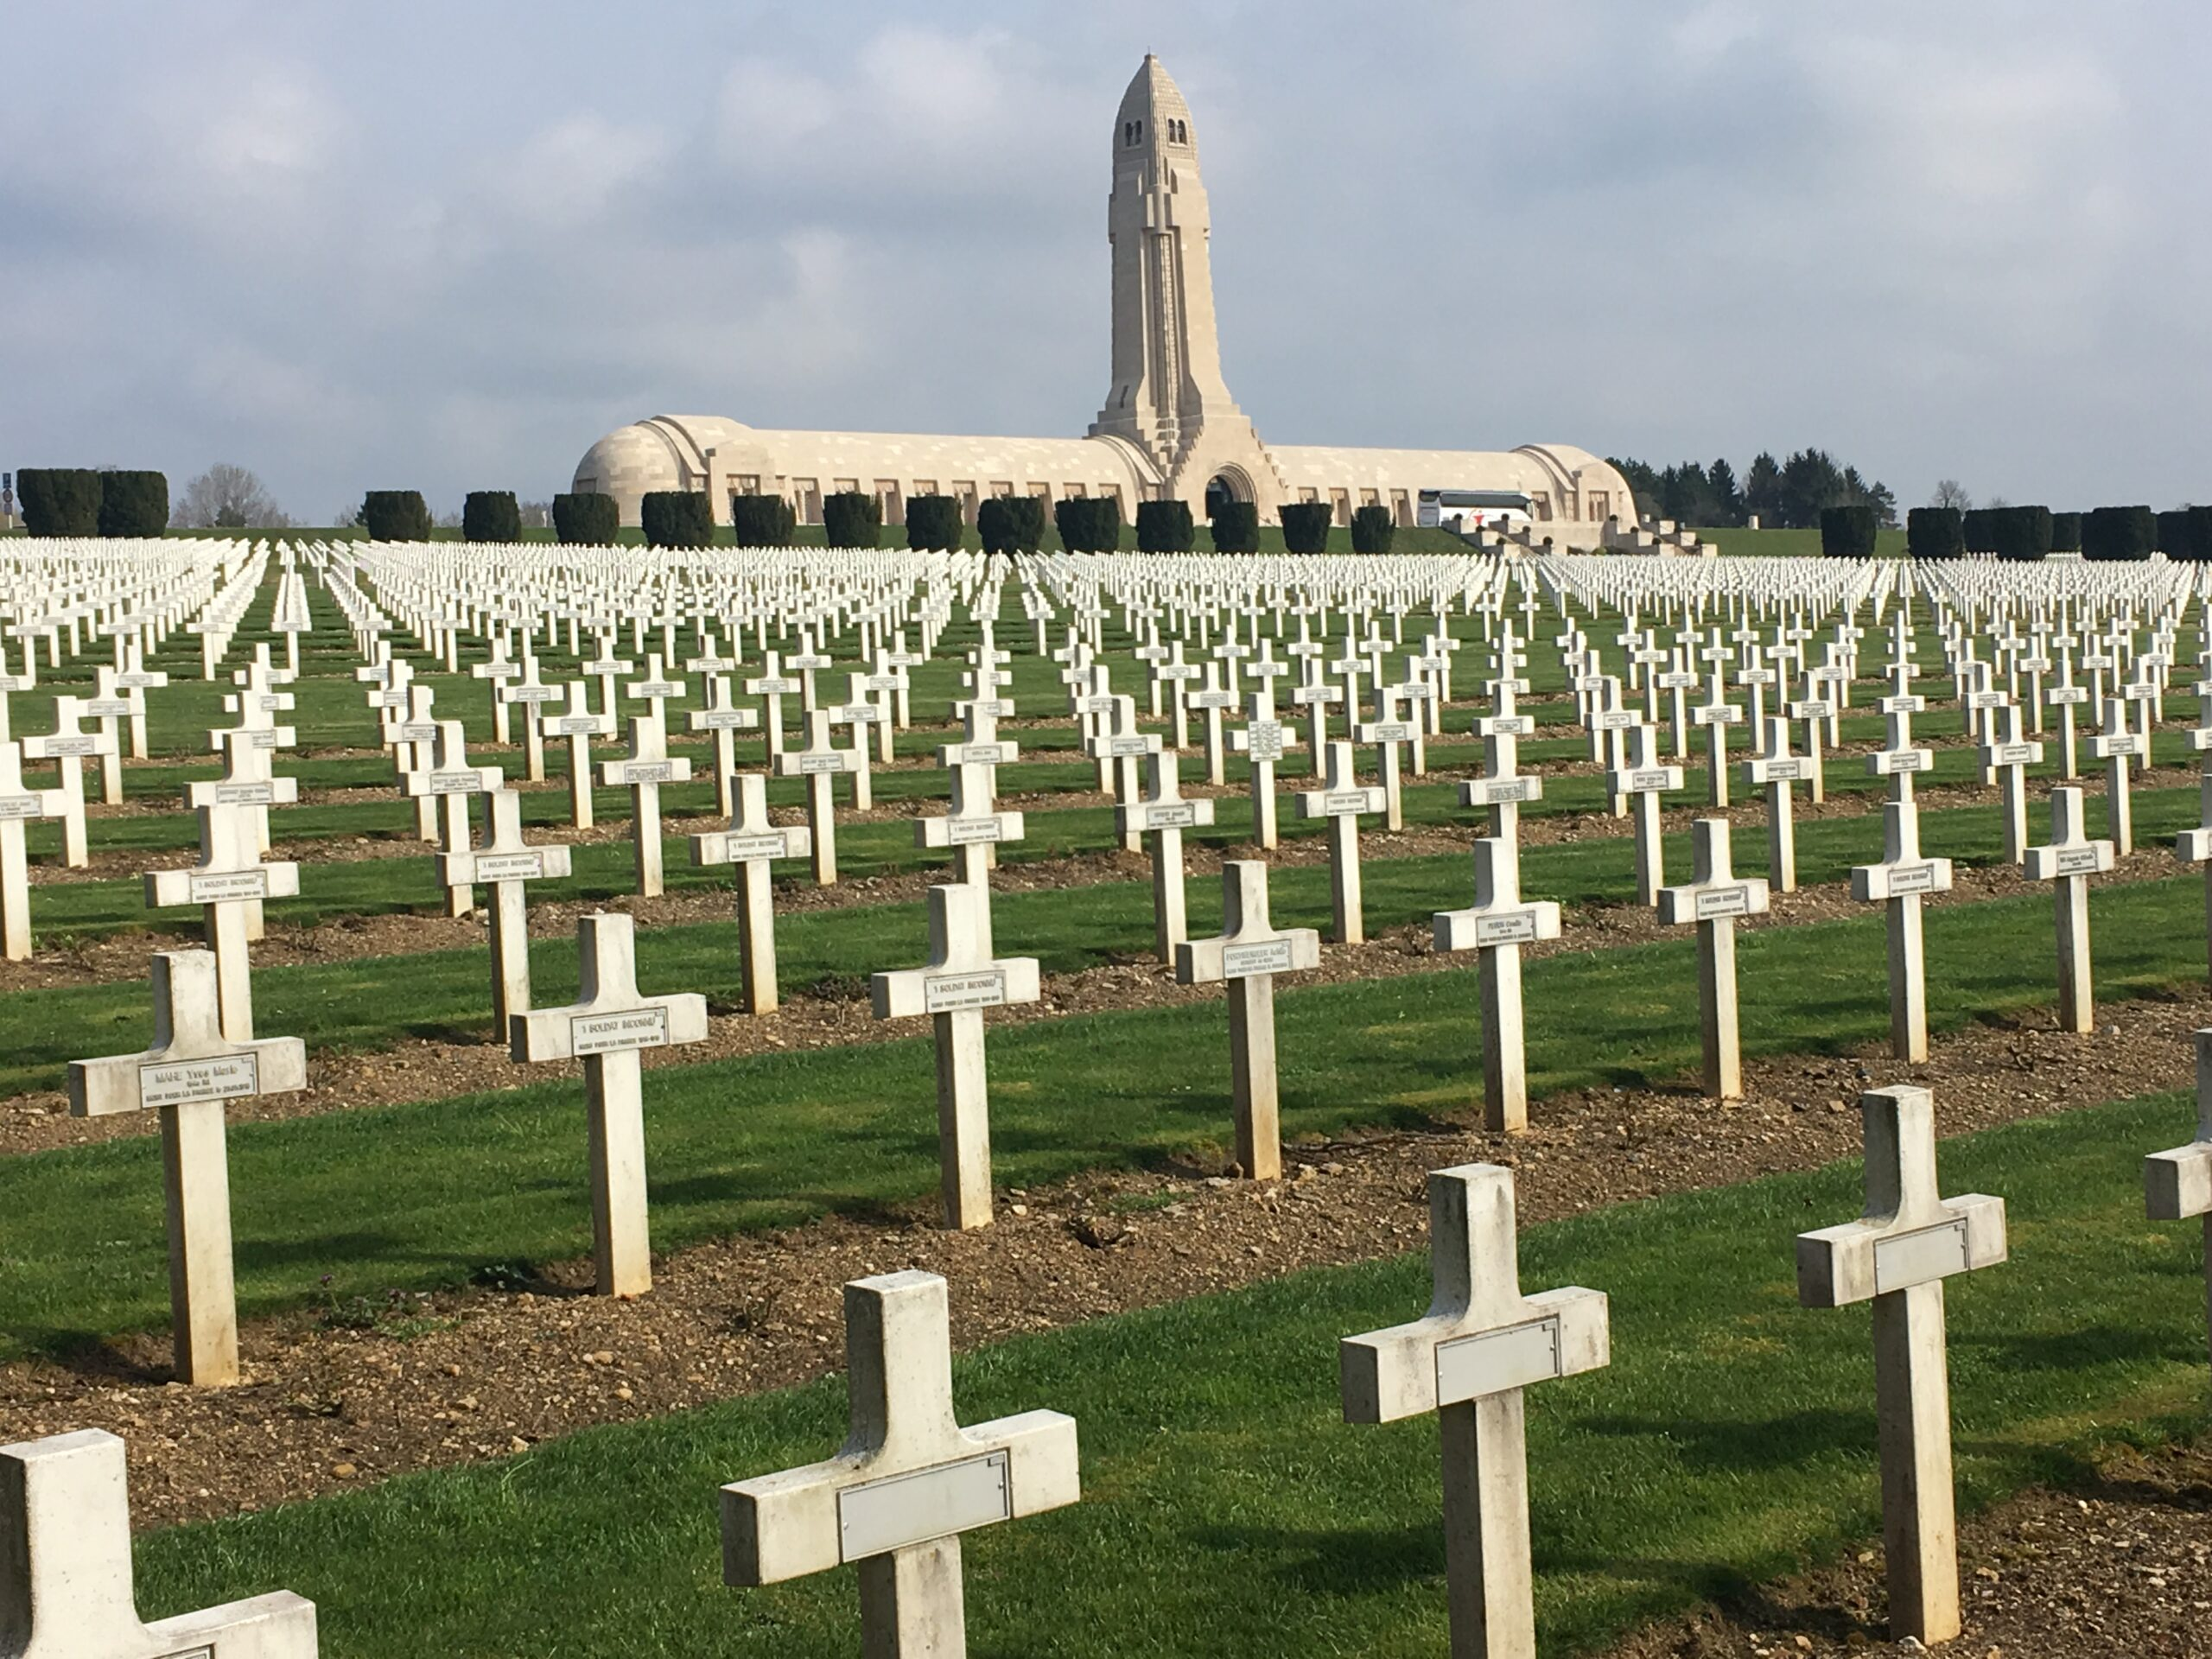 Battle-scarred Verdun: the saddest city in France